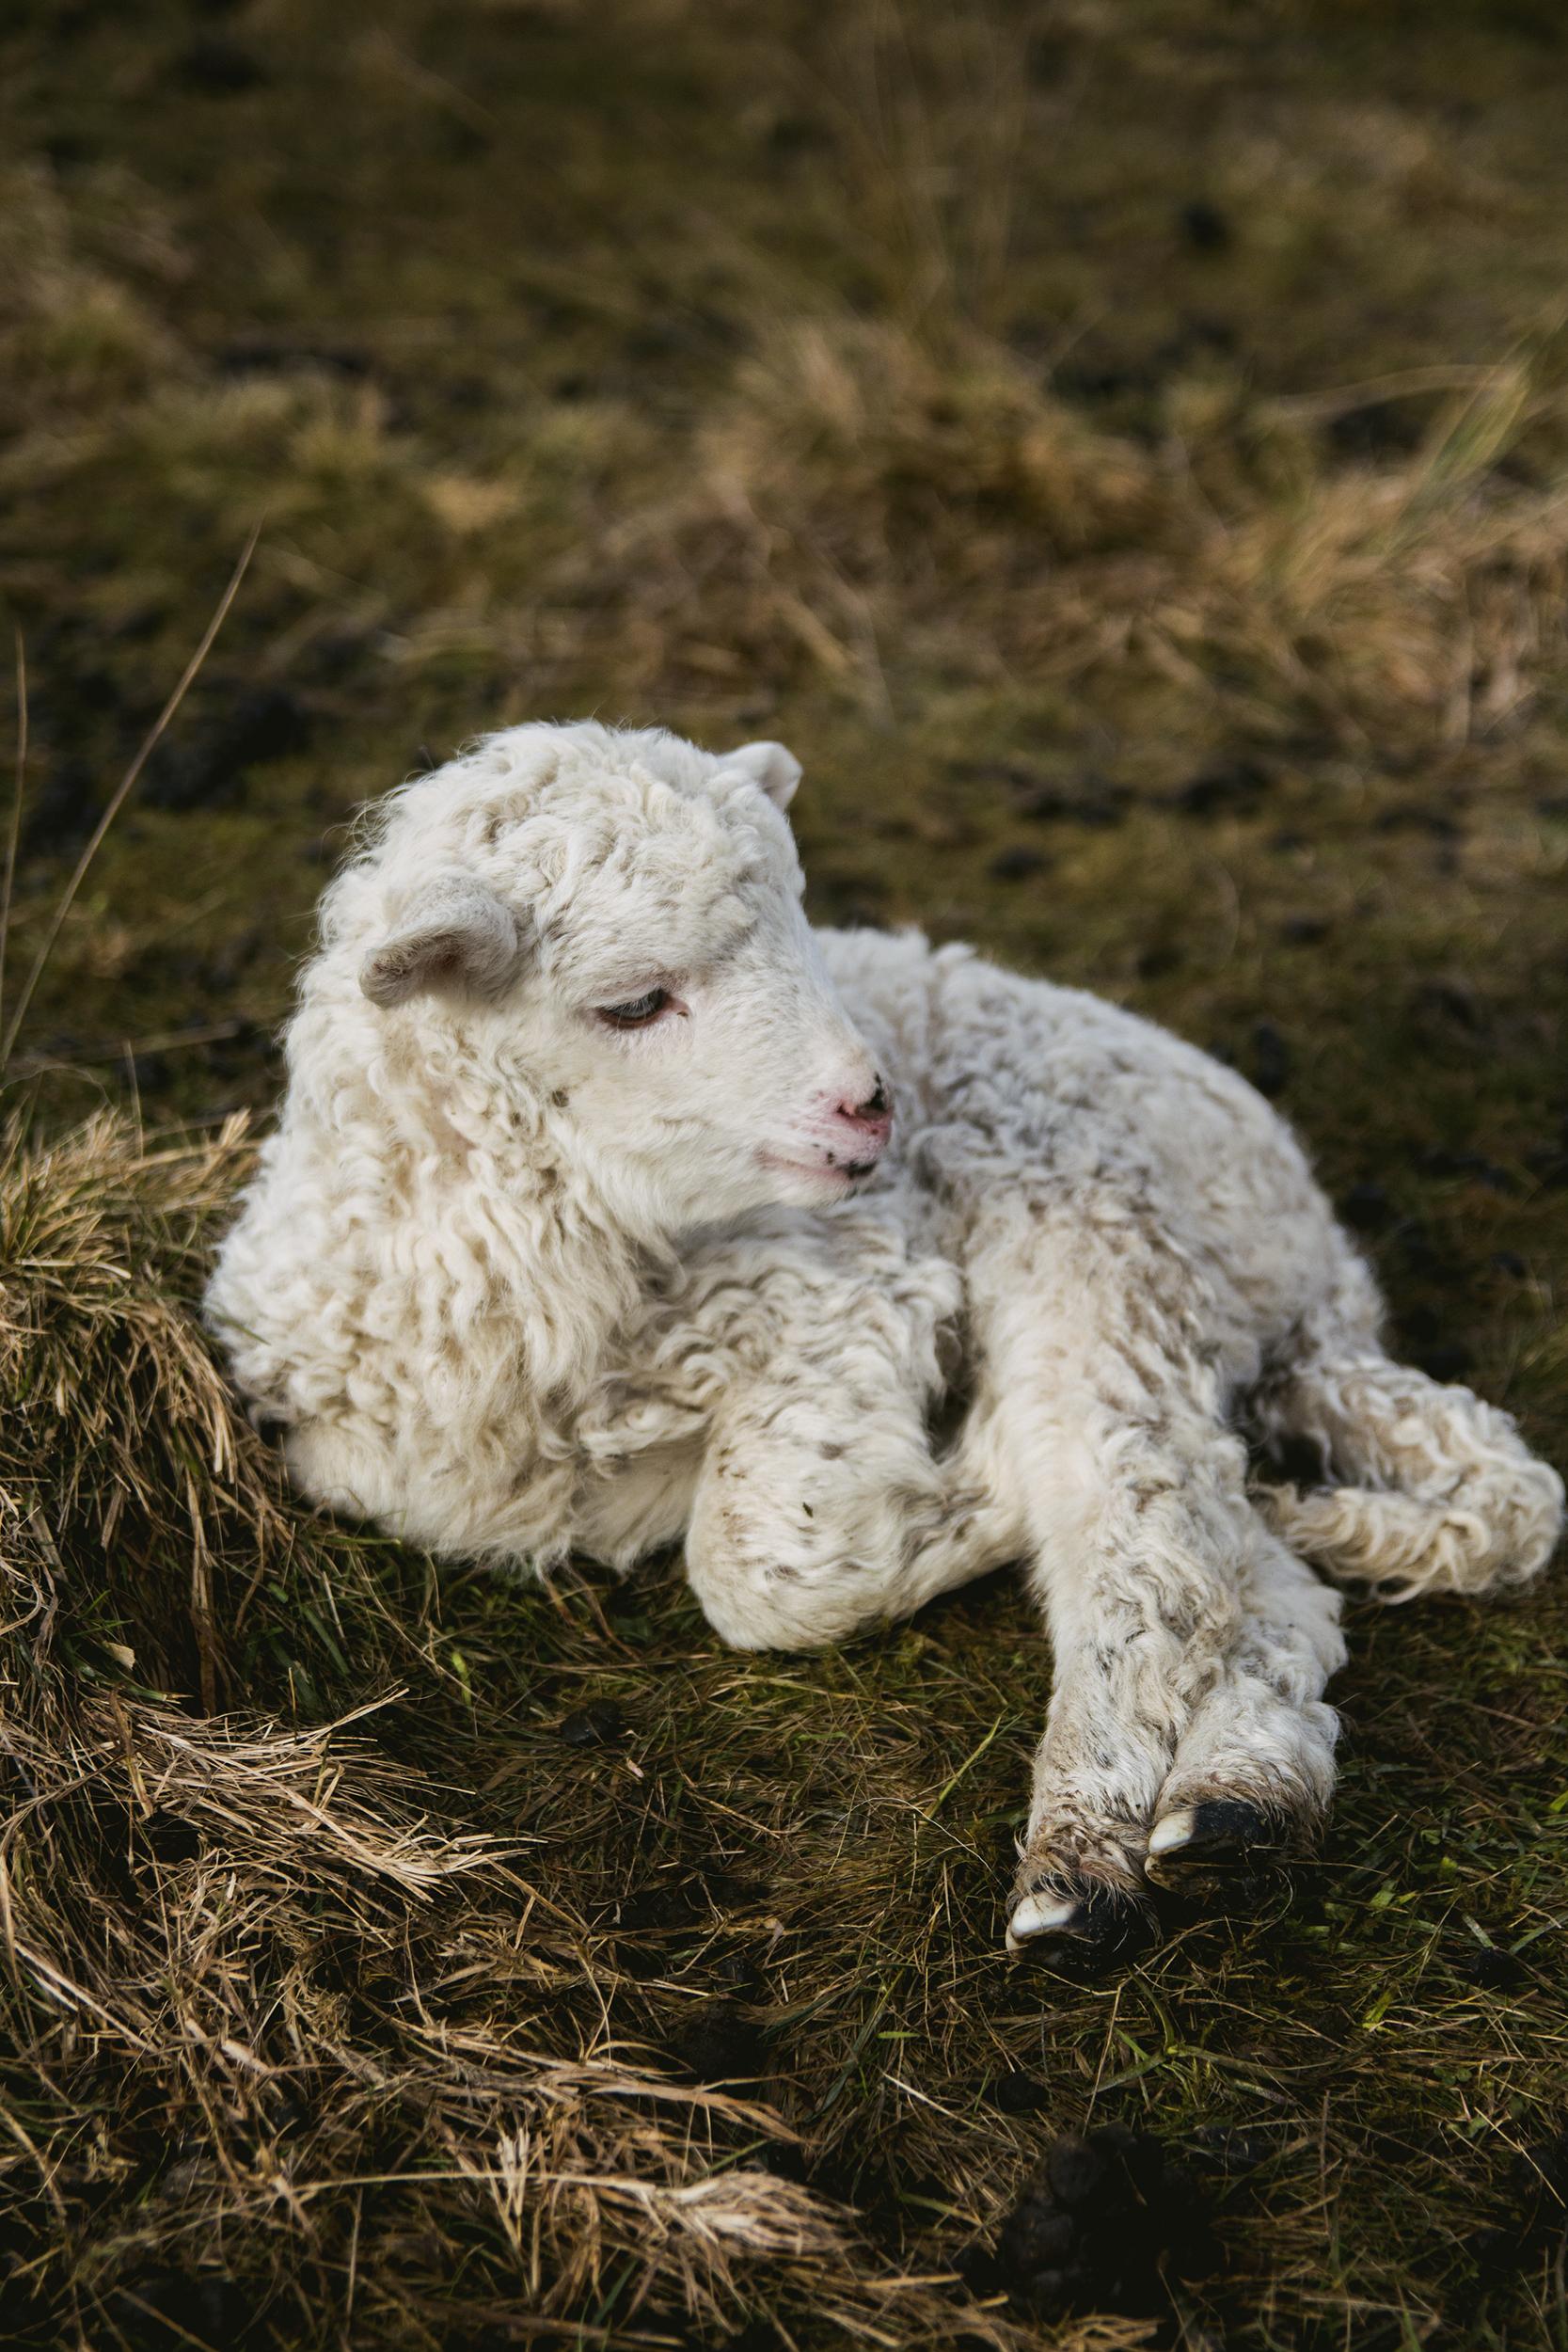 White Lamb Near Fence 183 Free Stock Photo